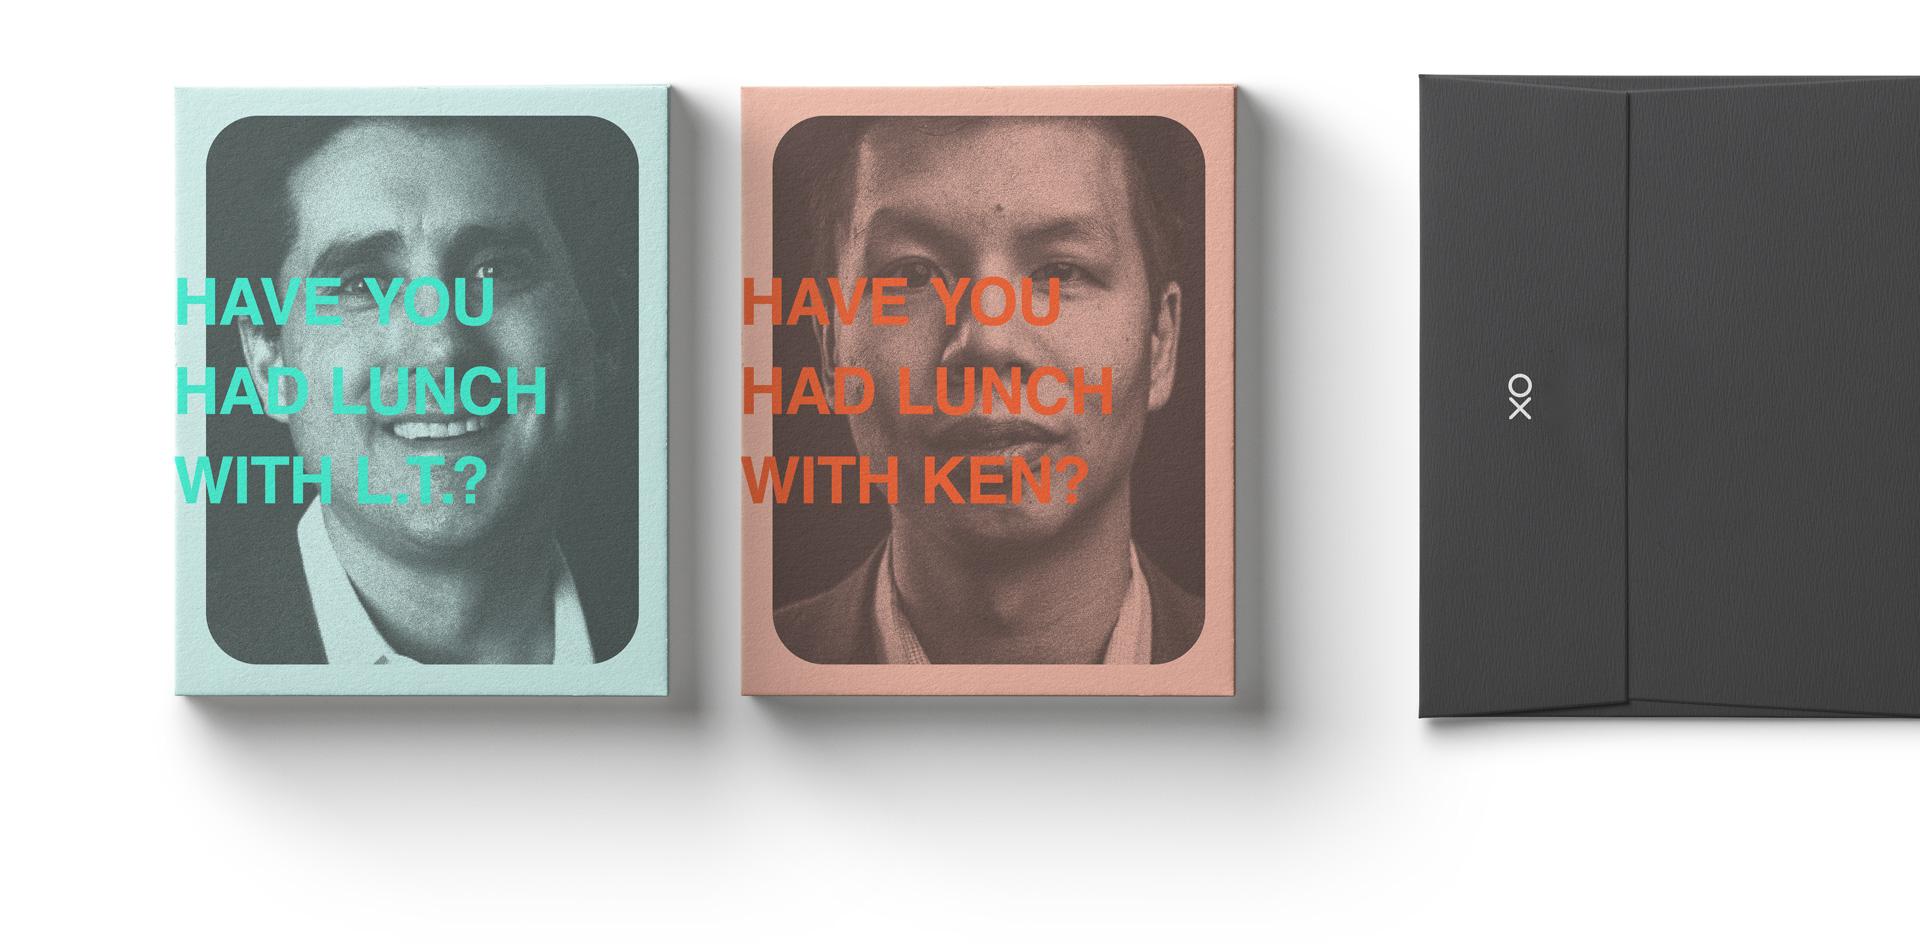 Promotional marketing cards